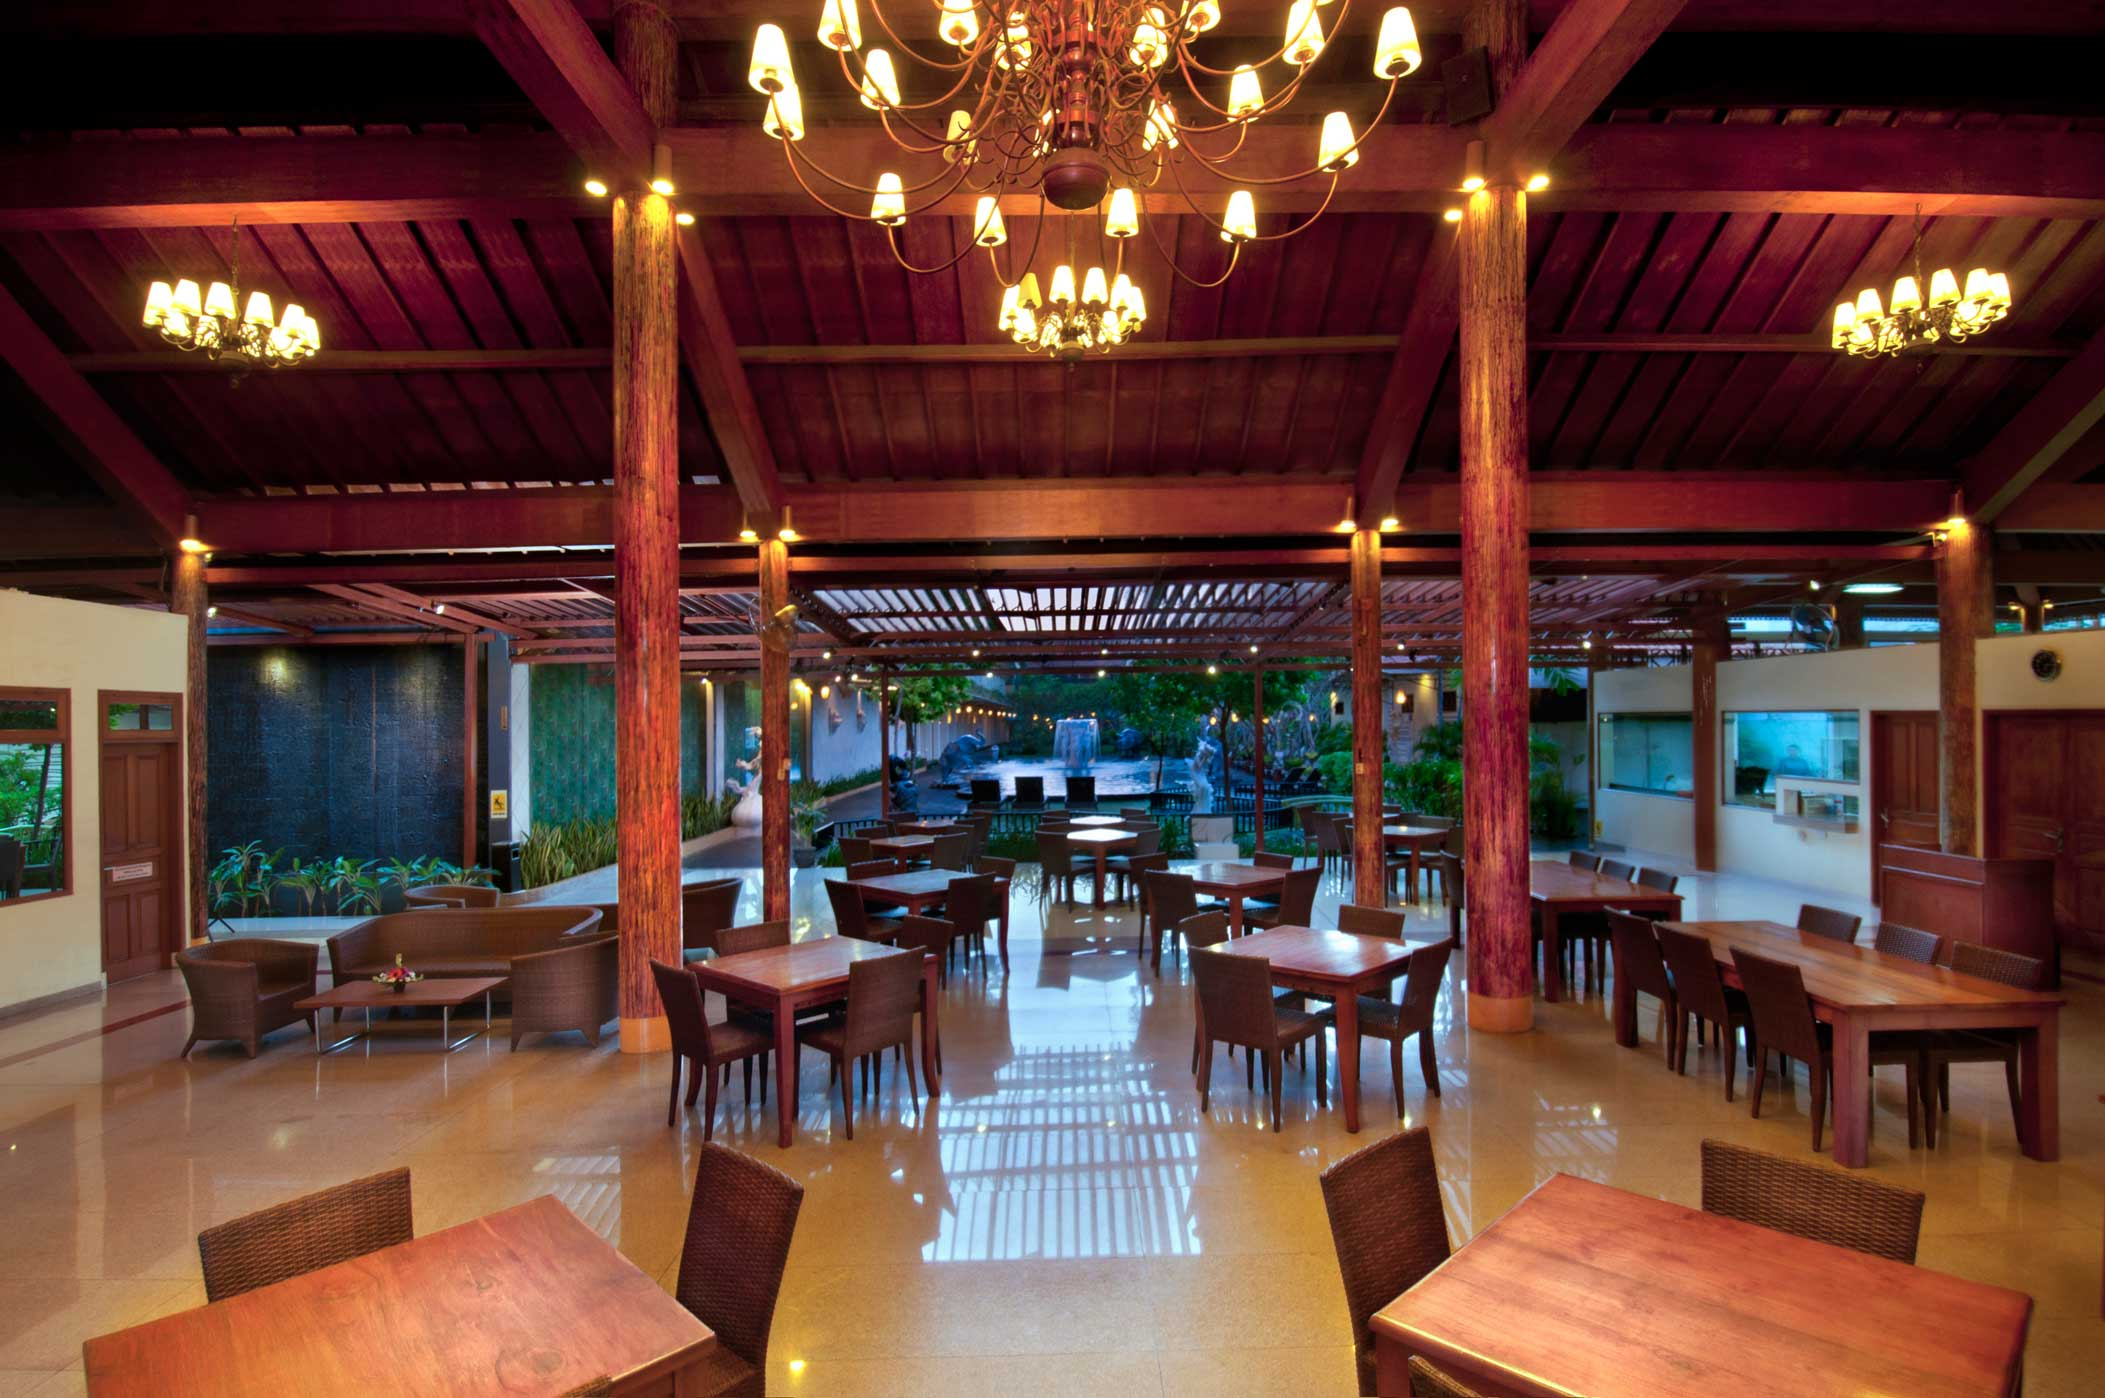 Restaurant  Febris Hotel  Spa  Bali Hotel Kuta  Bali